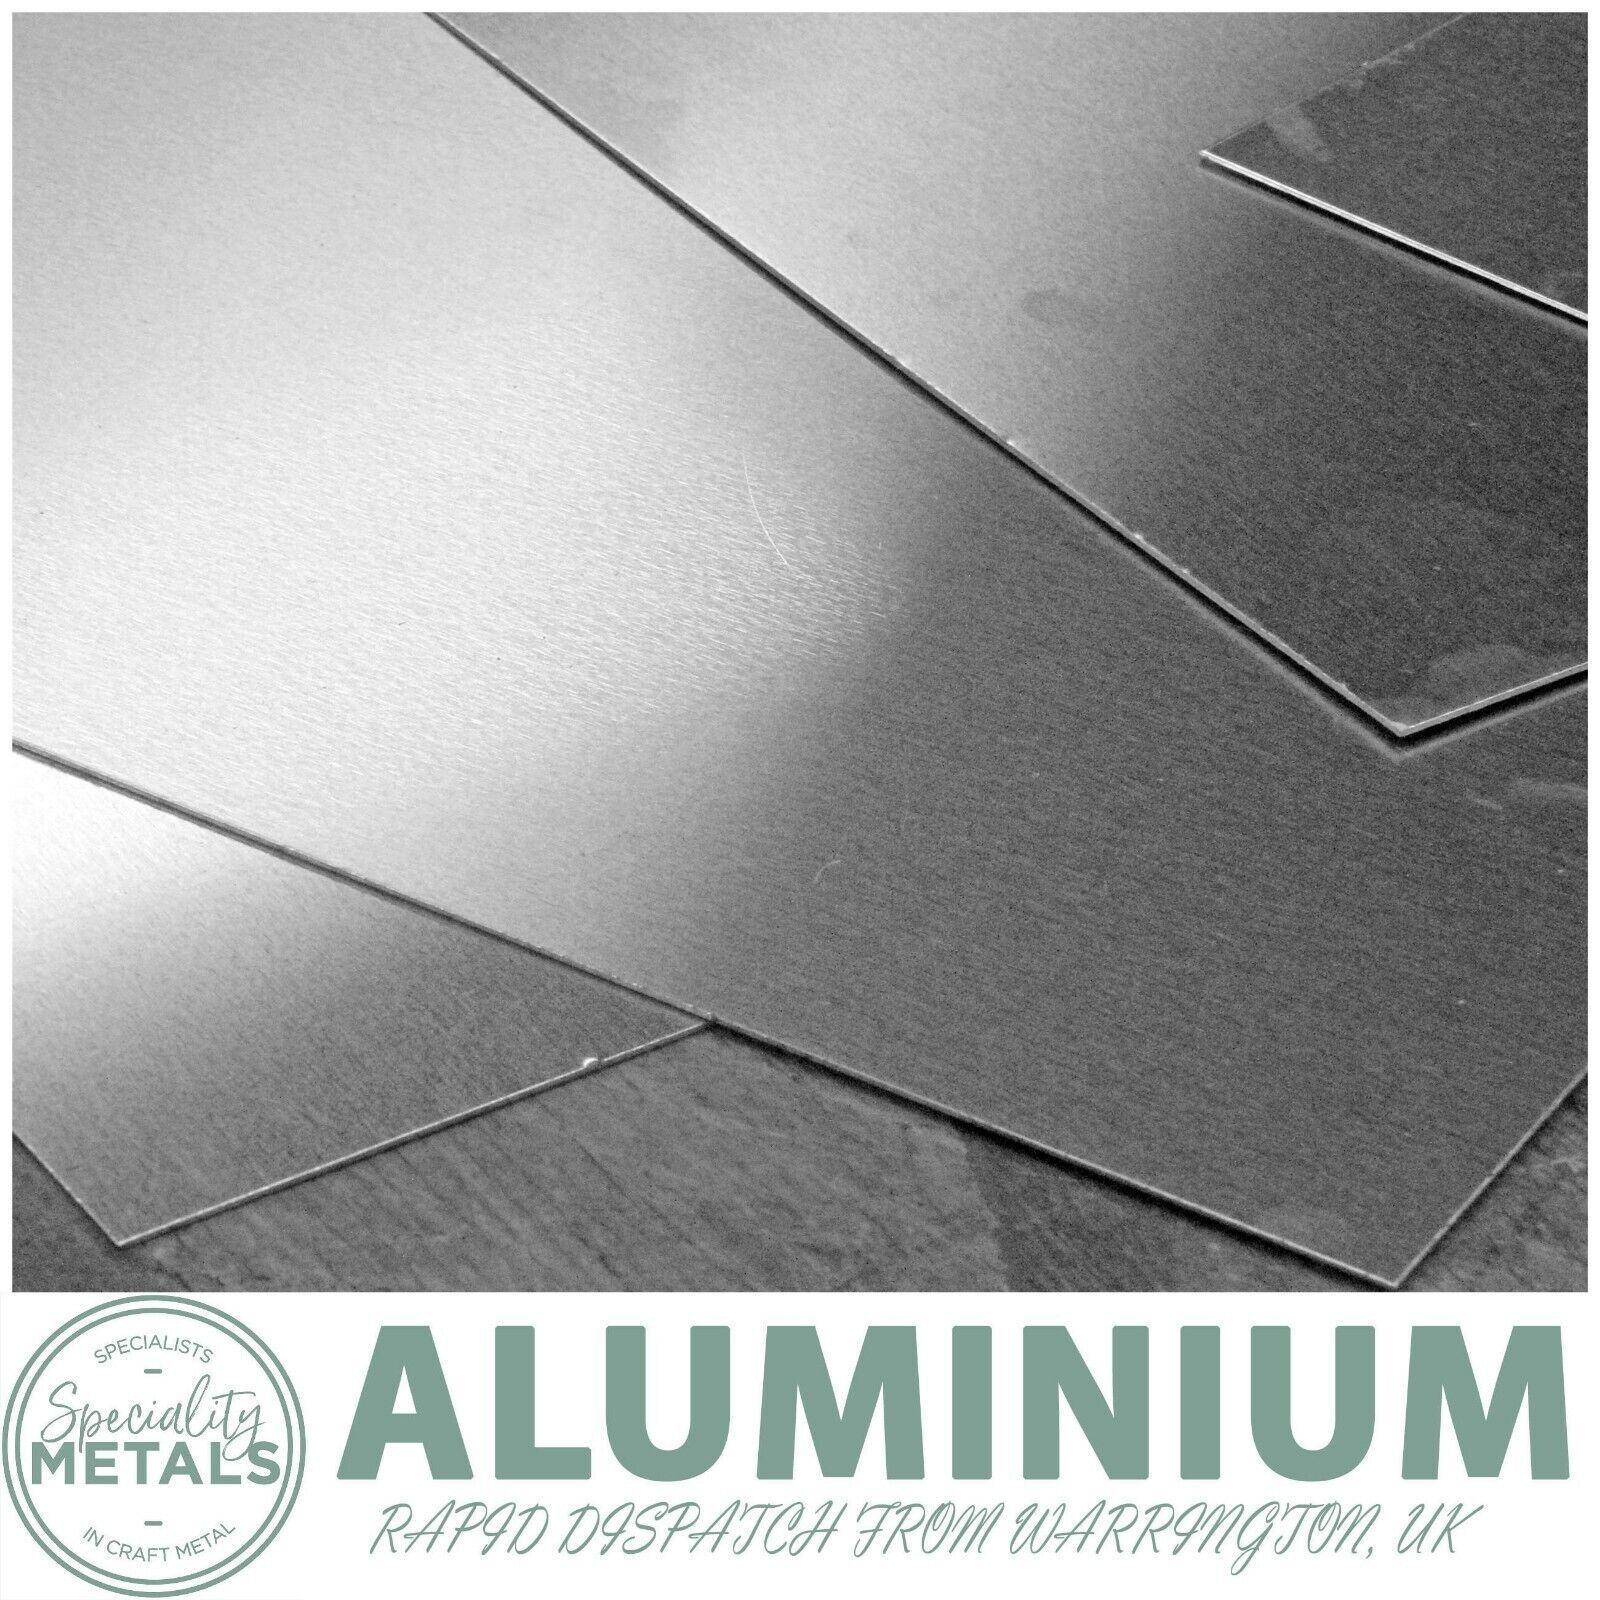 0.5mm to 2.5mm Aluminium Sheet Metal Plate 1050 H14 Grade UK Made Guillotine Cut